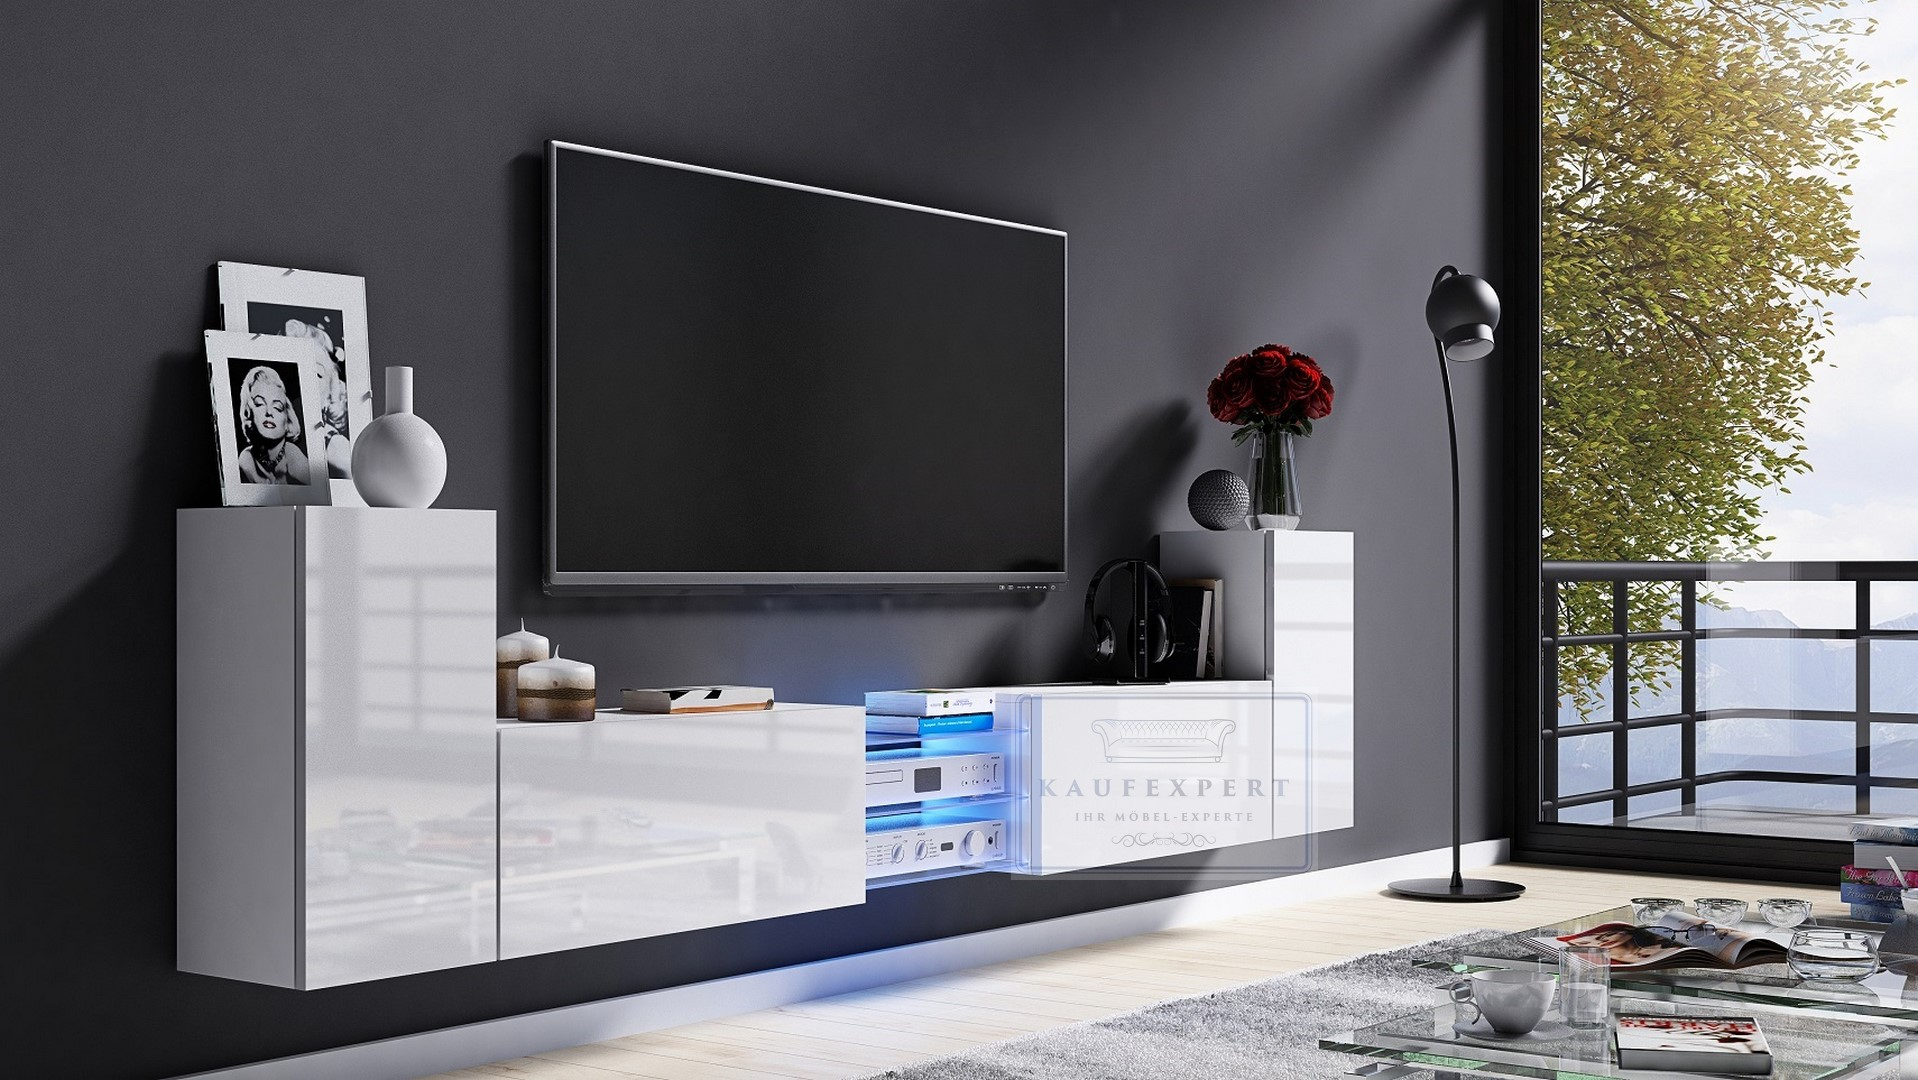 kaufexpert tv lowboard galaxy wei hochglanz wei mdf design board hifi tisch beleuchtung. Black Bedroom Furniture Sets. Home Design Ideas